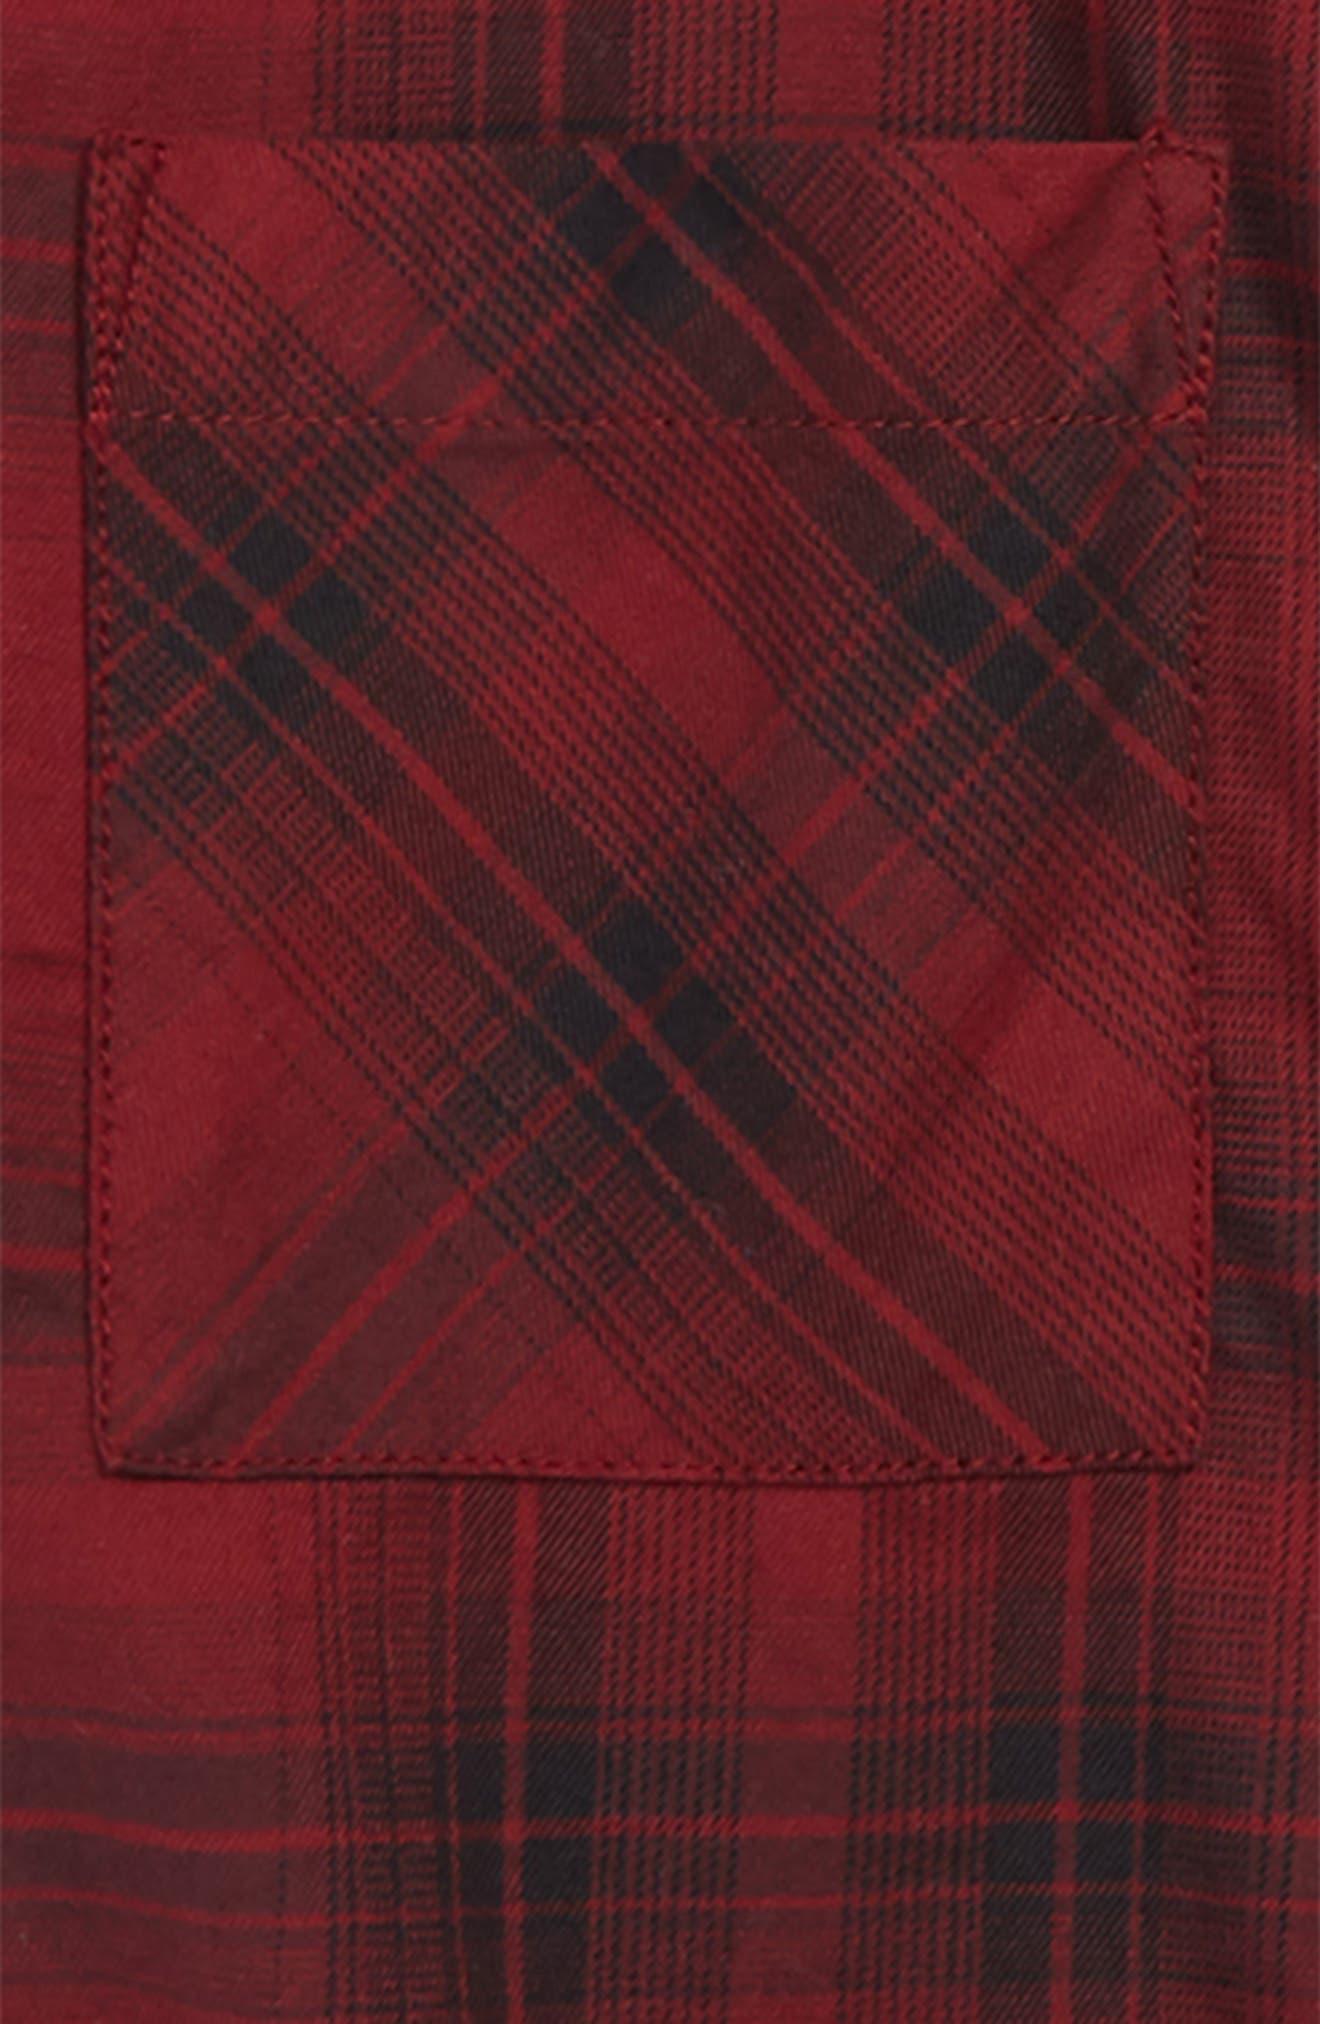 Distressed Plaid Flannel Shirt,                             Alternate thumbnail 2, color,                             RED GRAPE- BLACK PLAID